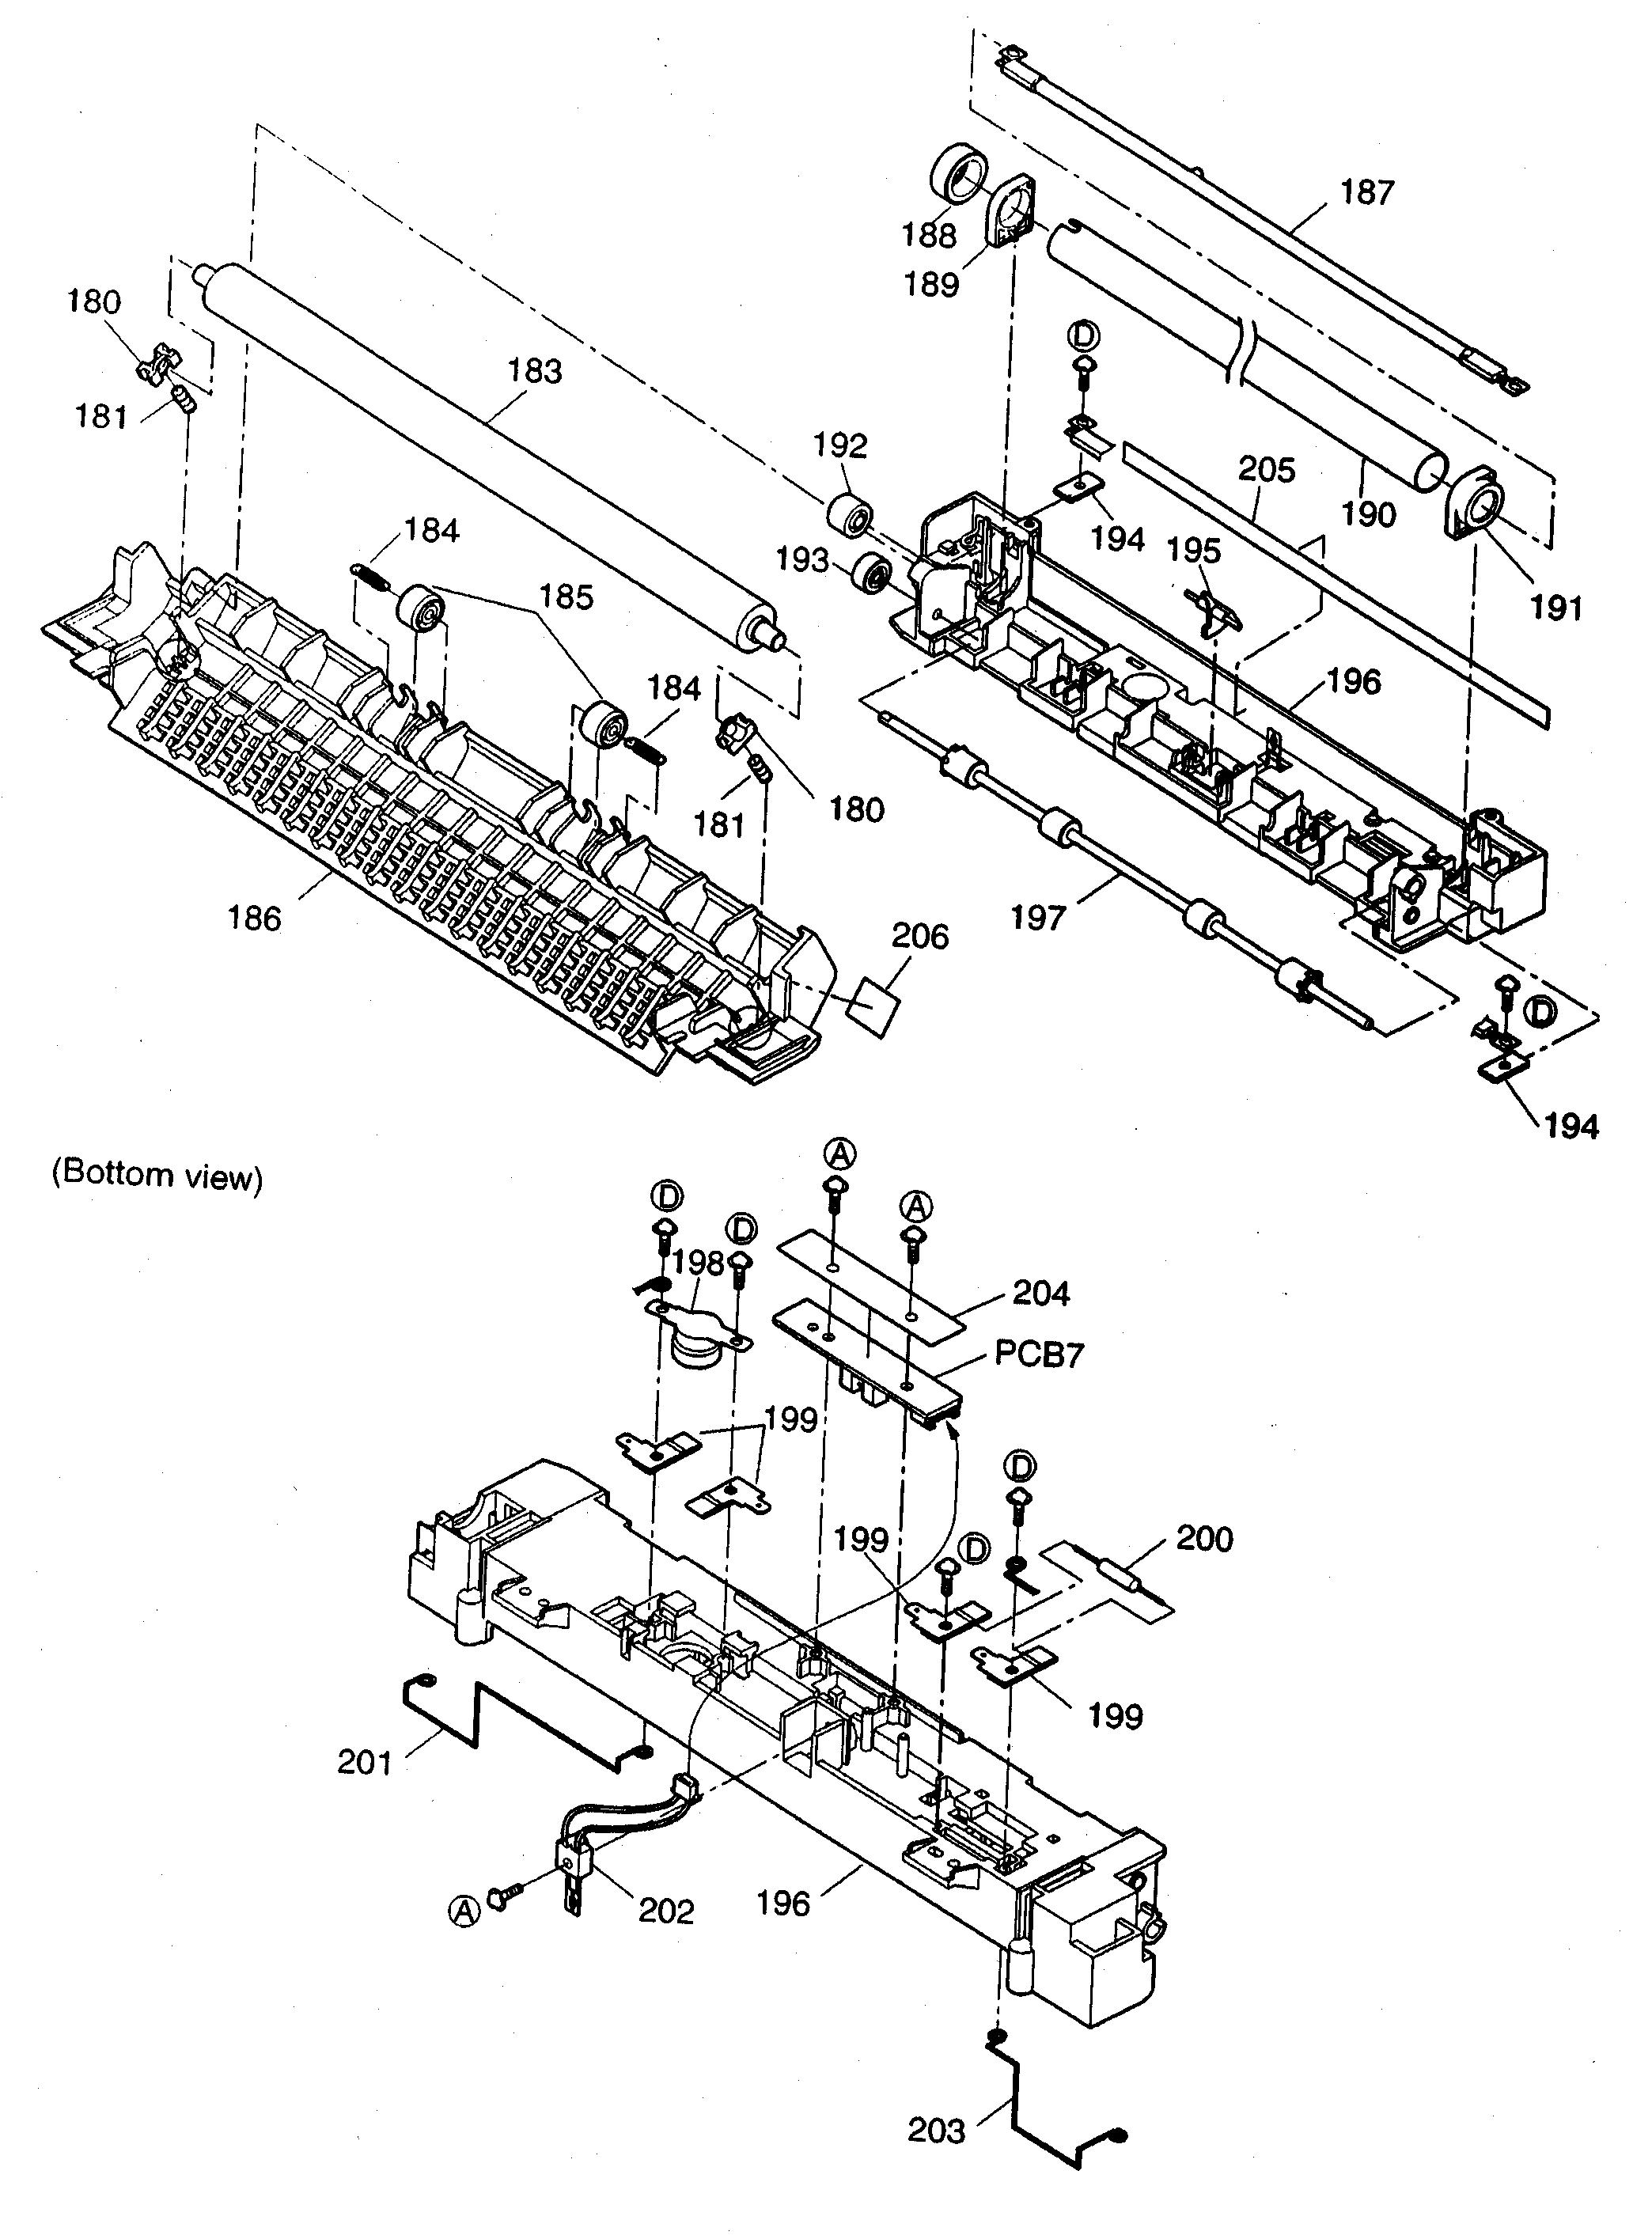 fuser block diagram  u0026 parts list for model kxflm551 panasonic